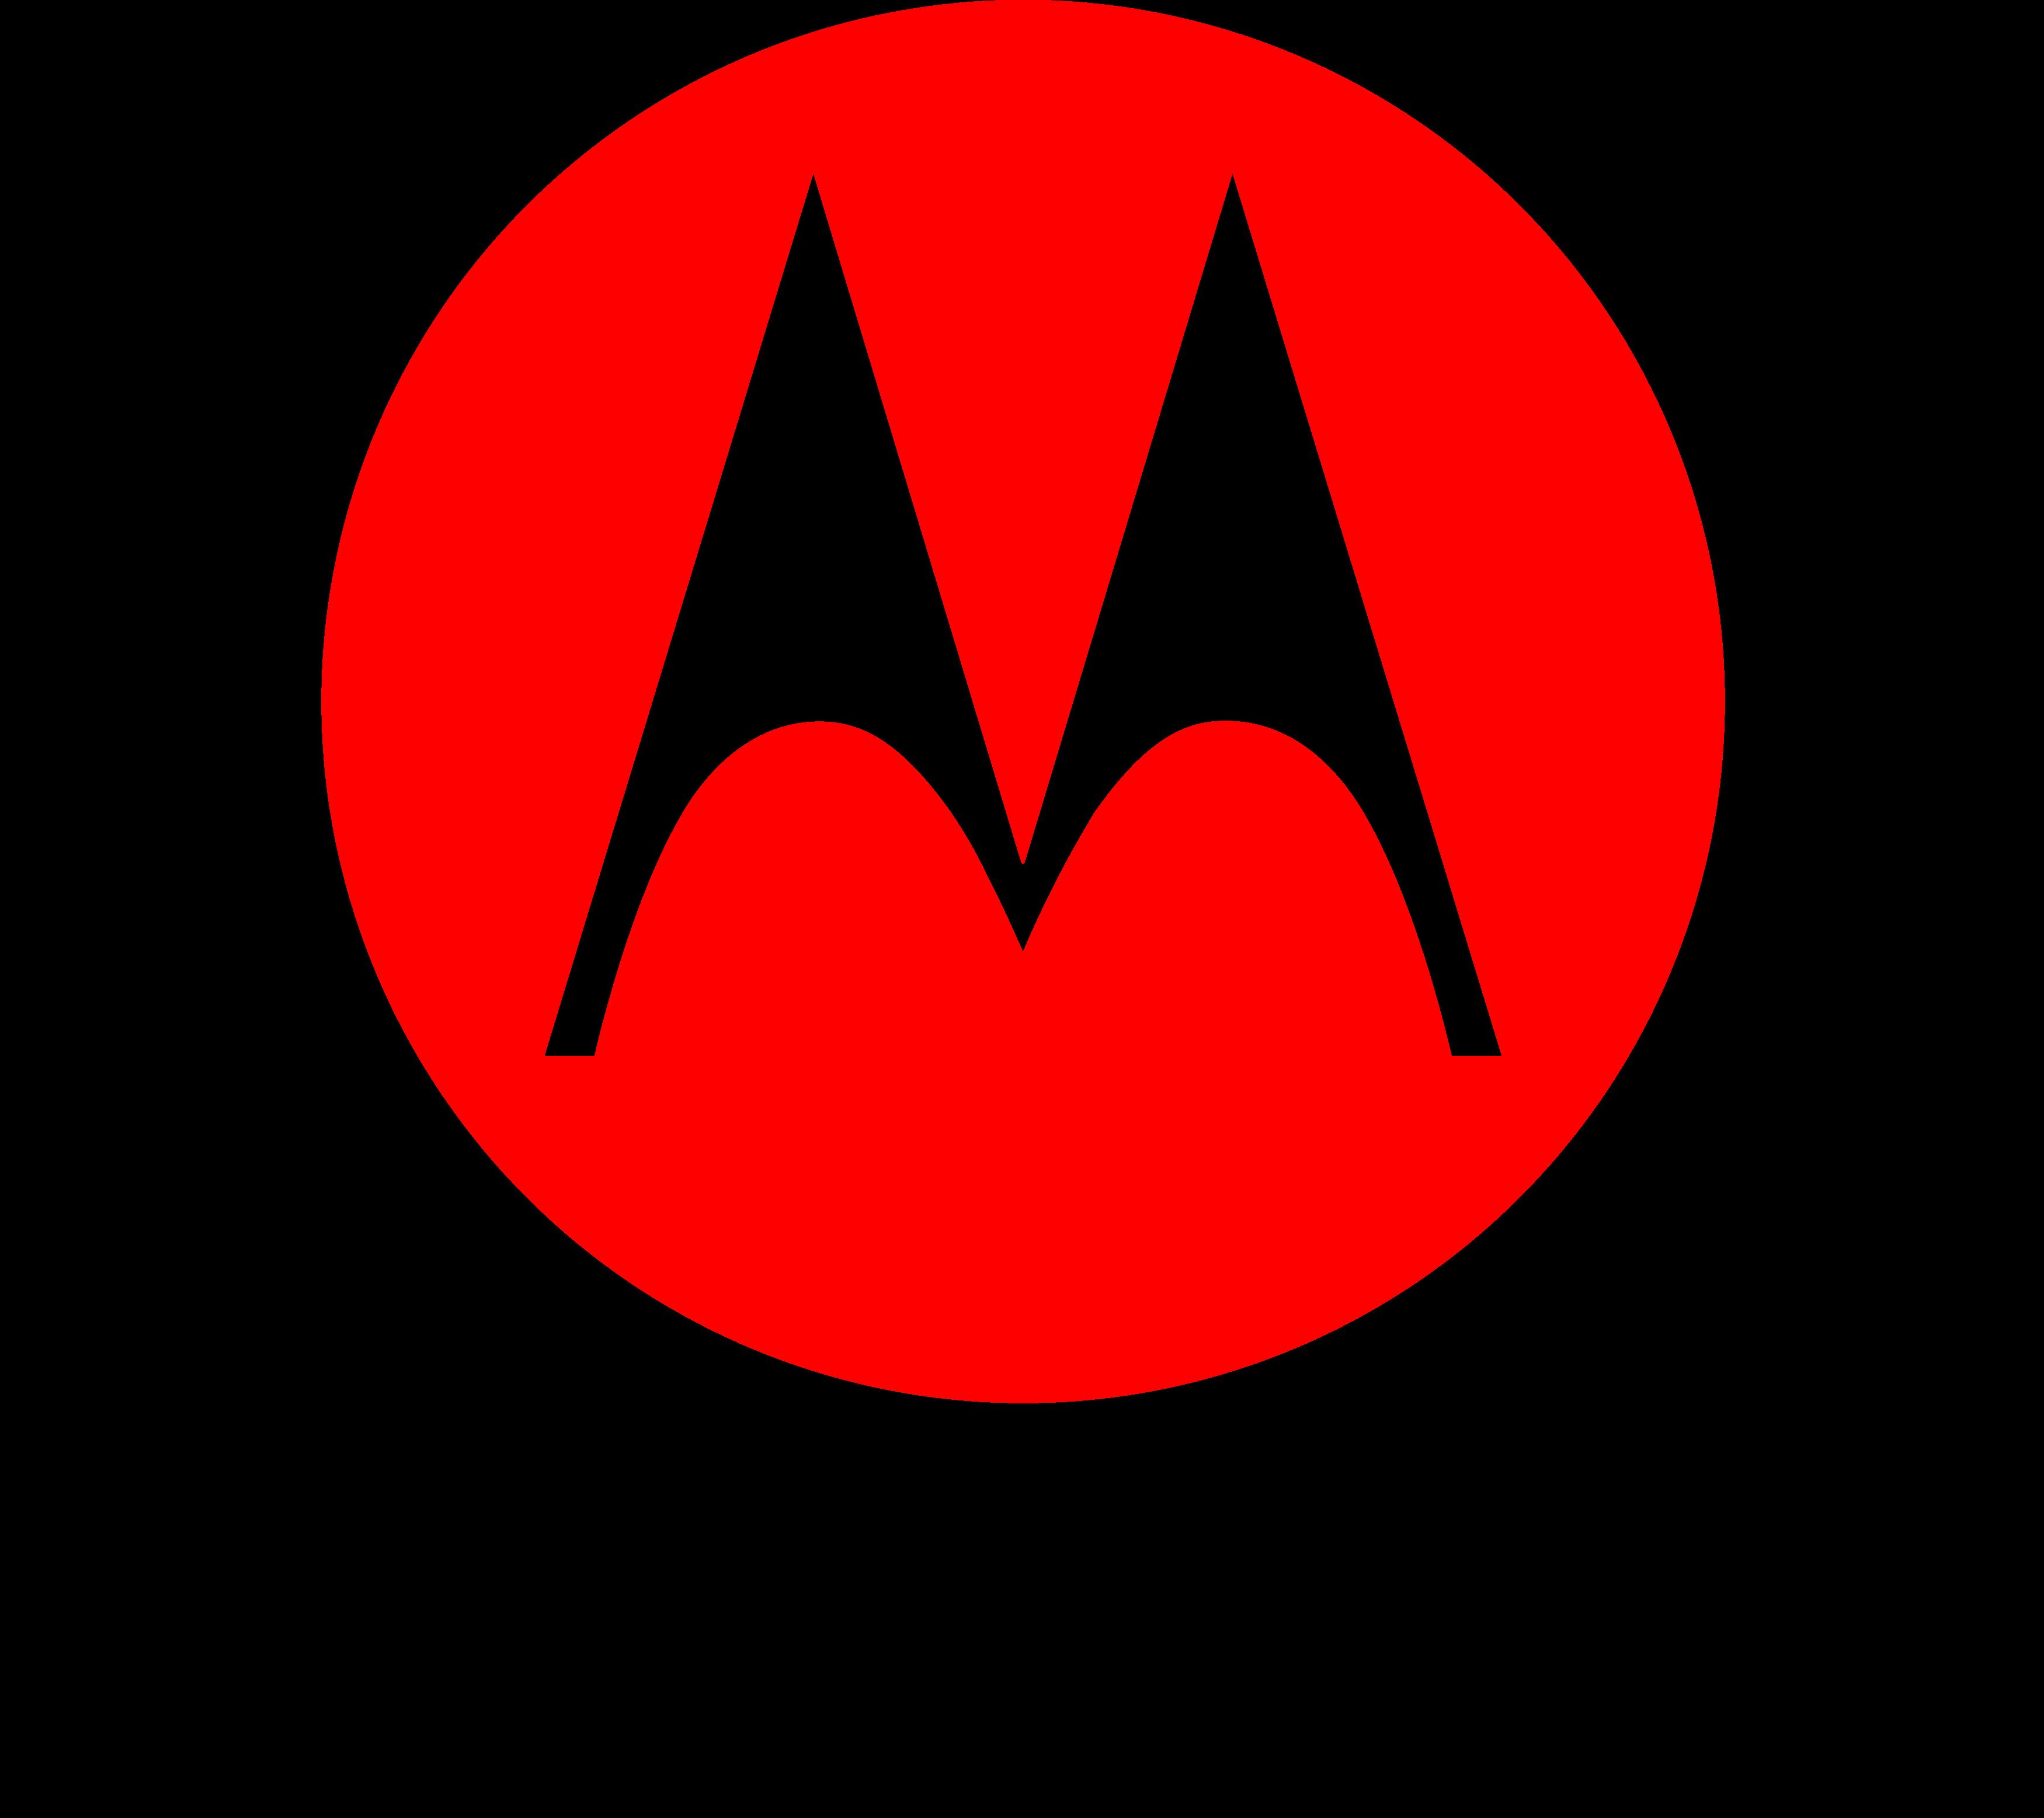 motorola logo 1 1 - Motorola Logo